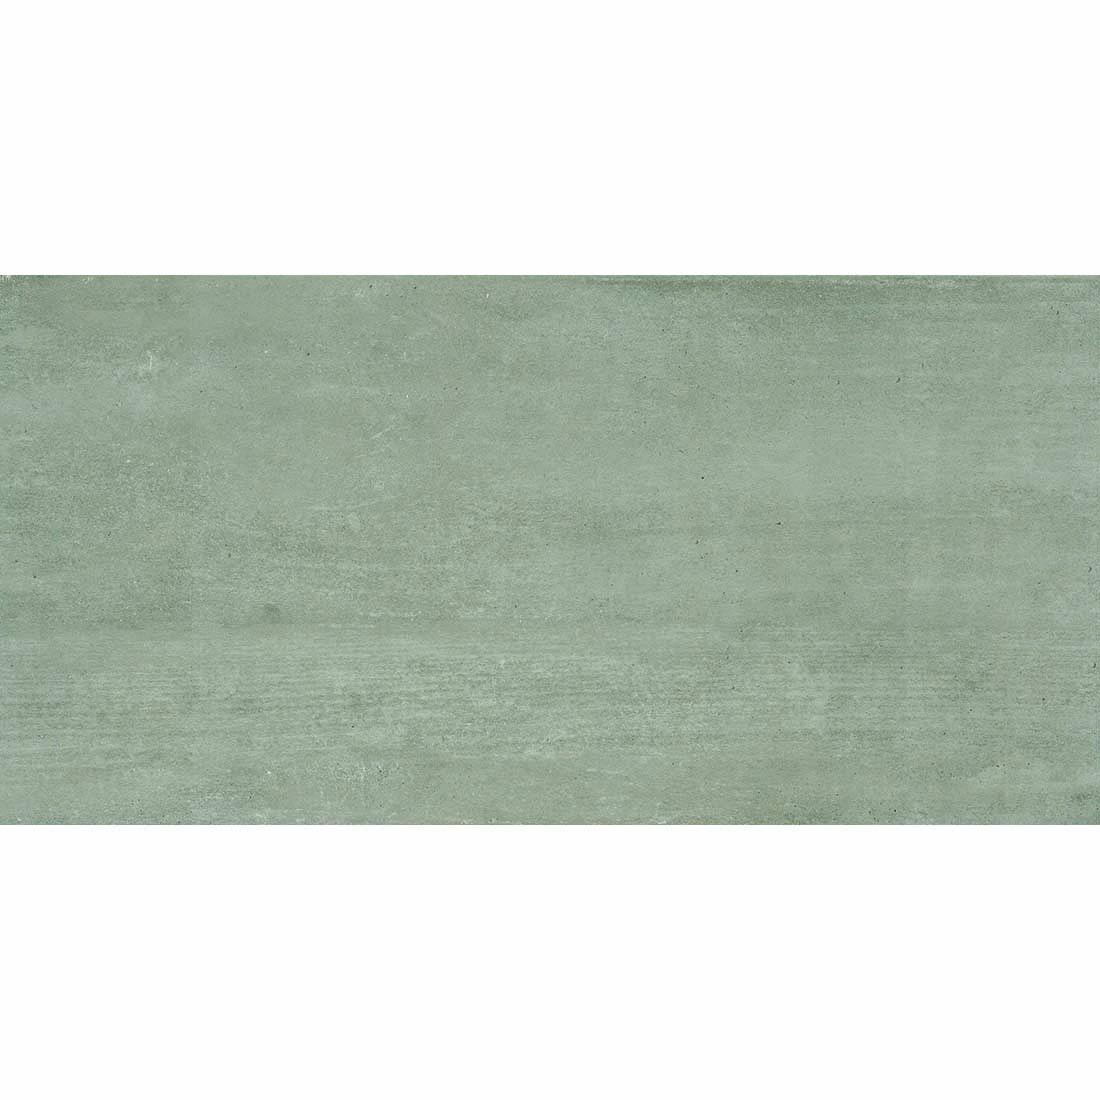 Westside 30x60 Grey Matt 1